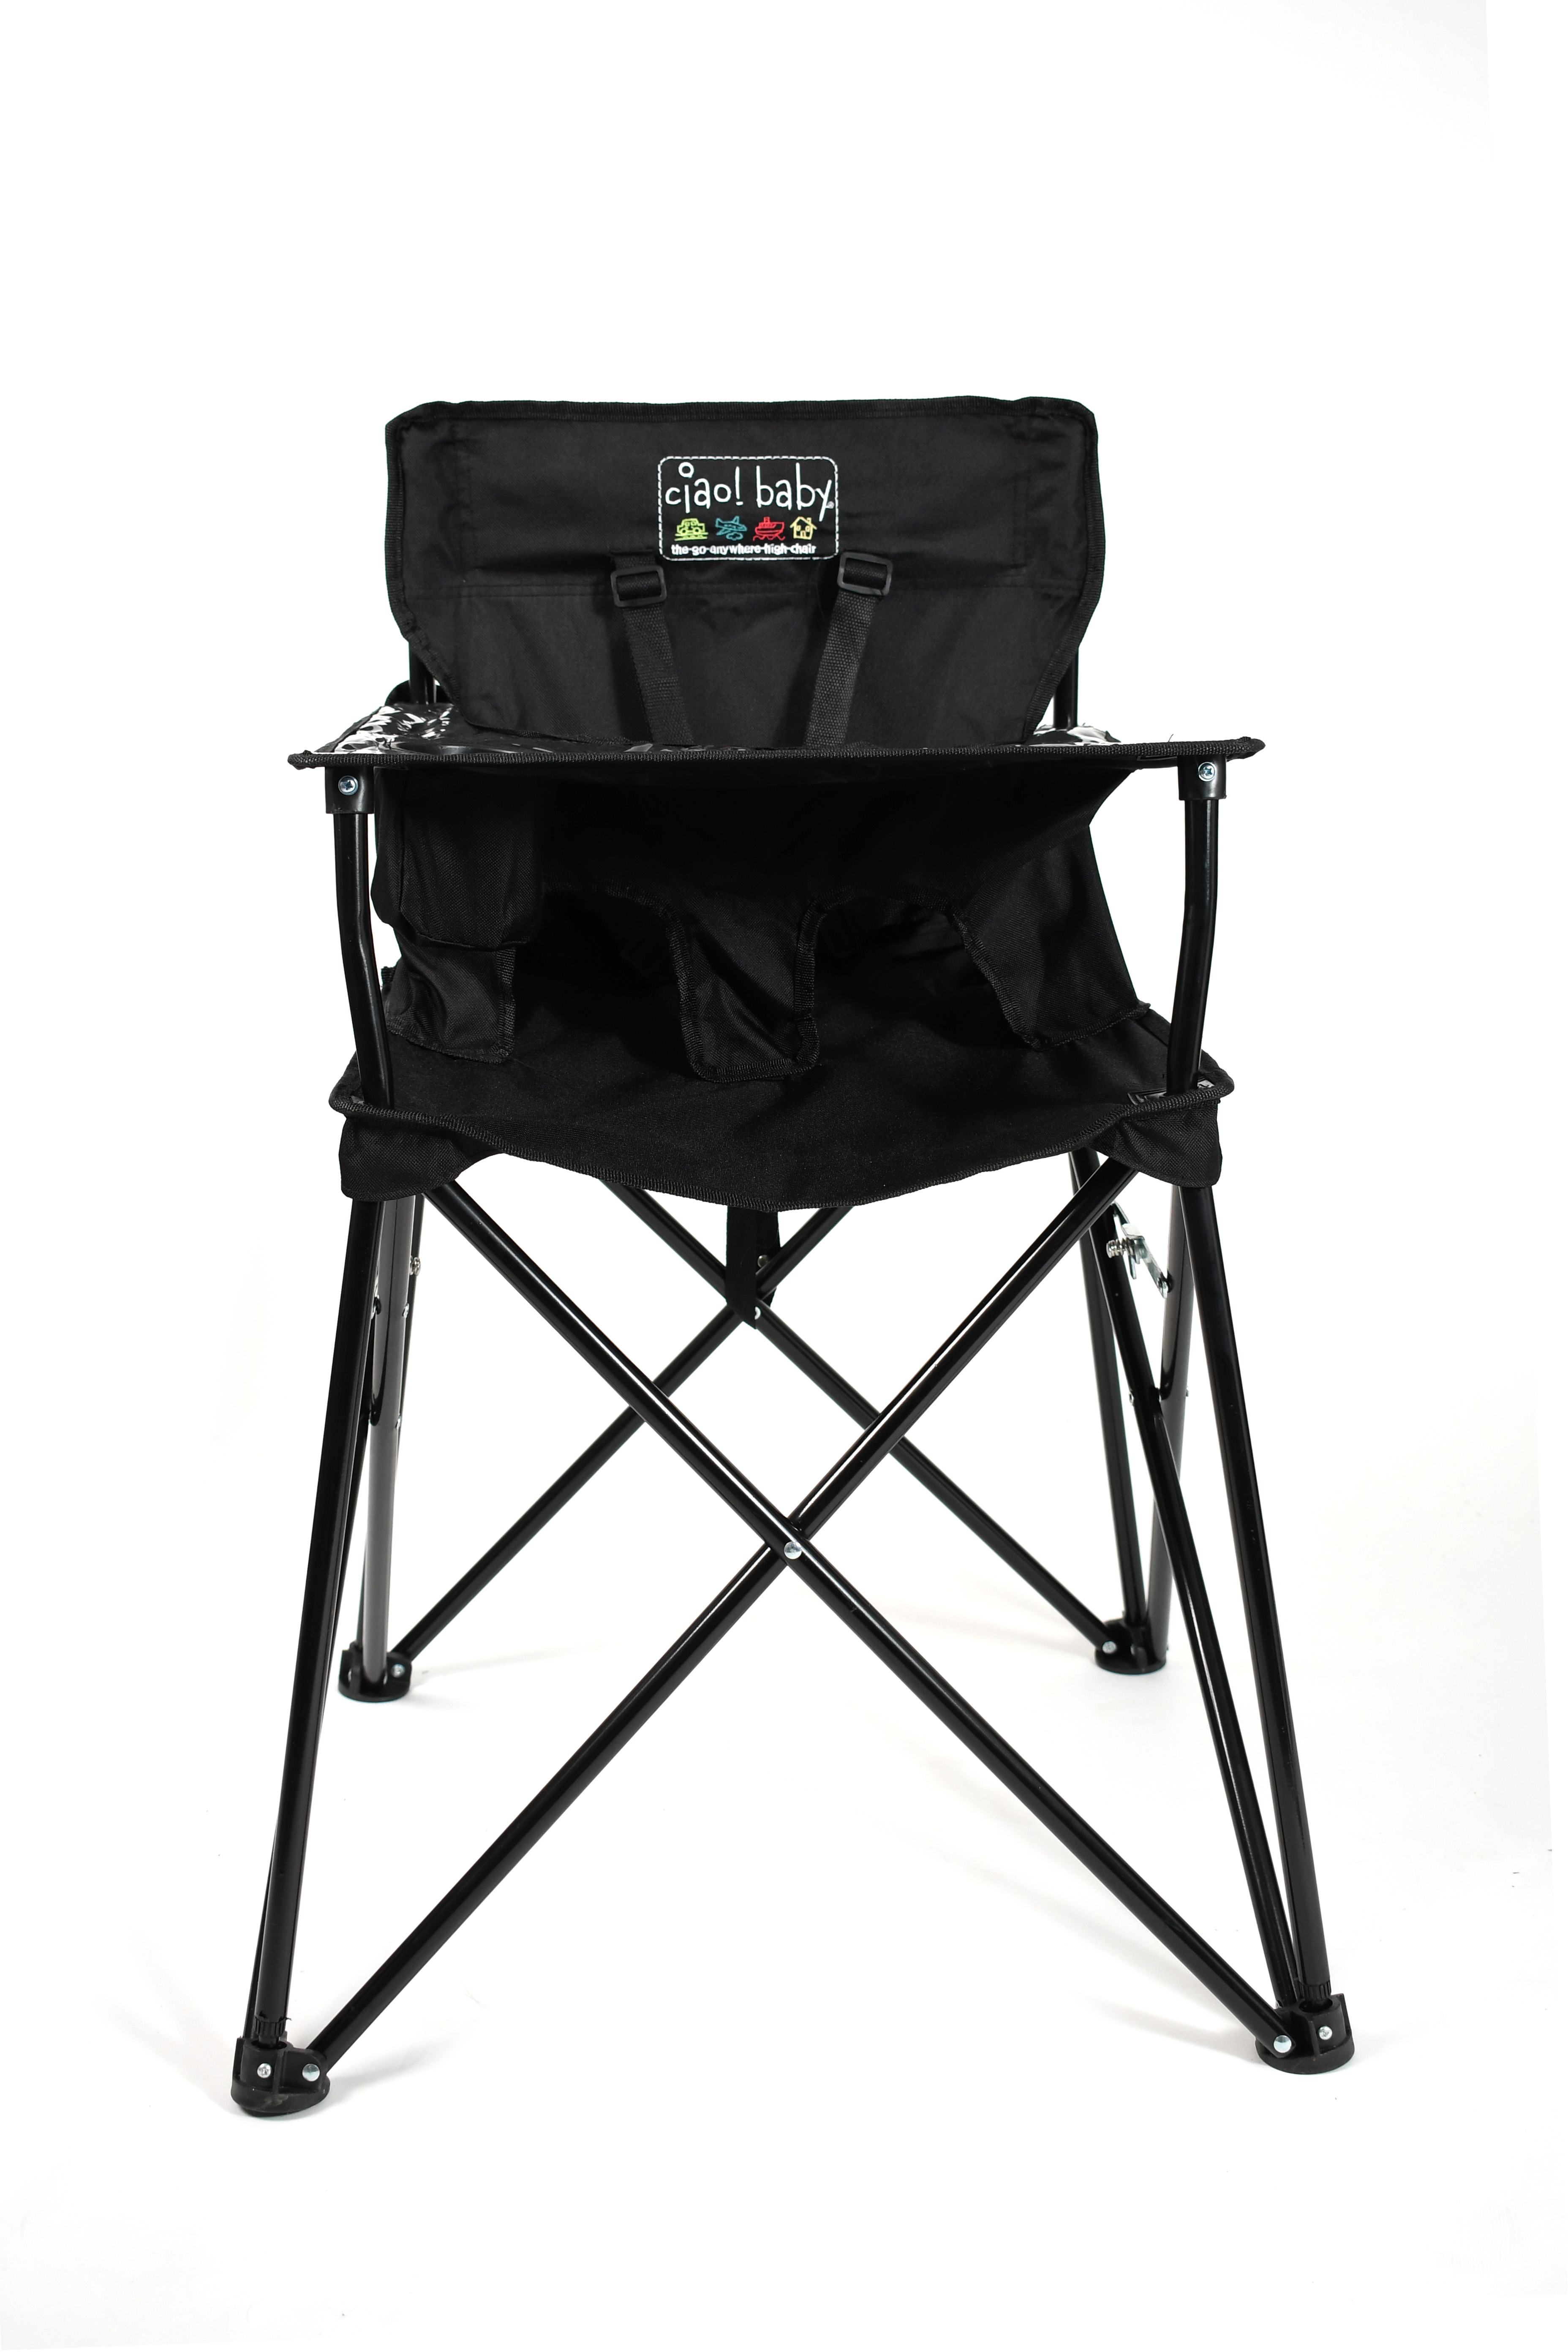 Super Ciao Baby Portable Kids Chair Walmart Com Spiritservingveterans Wood Chair Design Ideas Spiritservingveteransorg